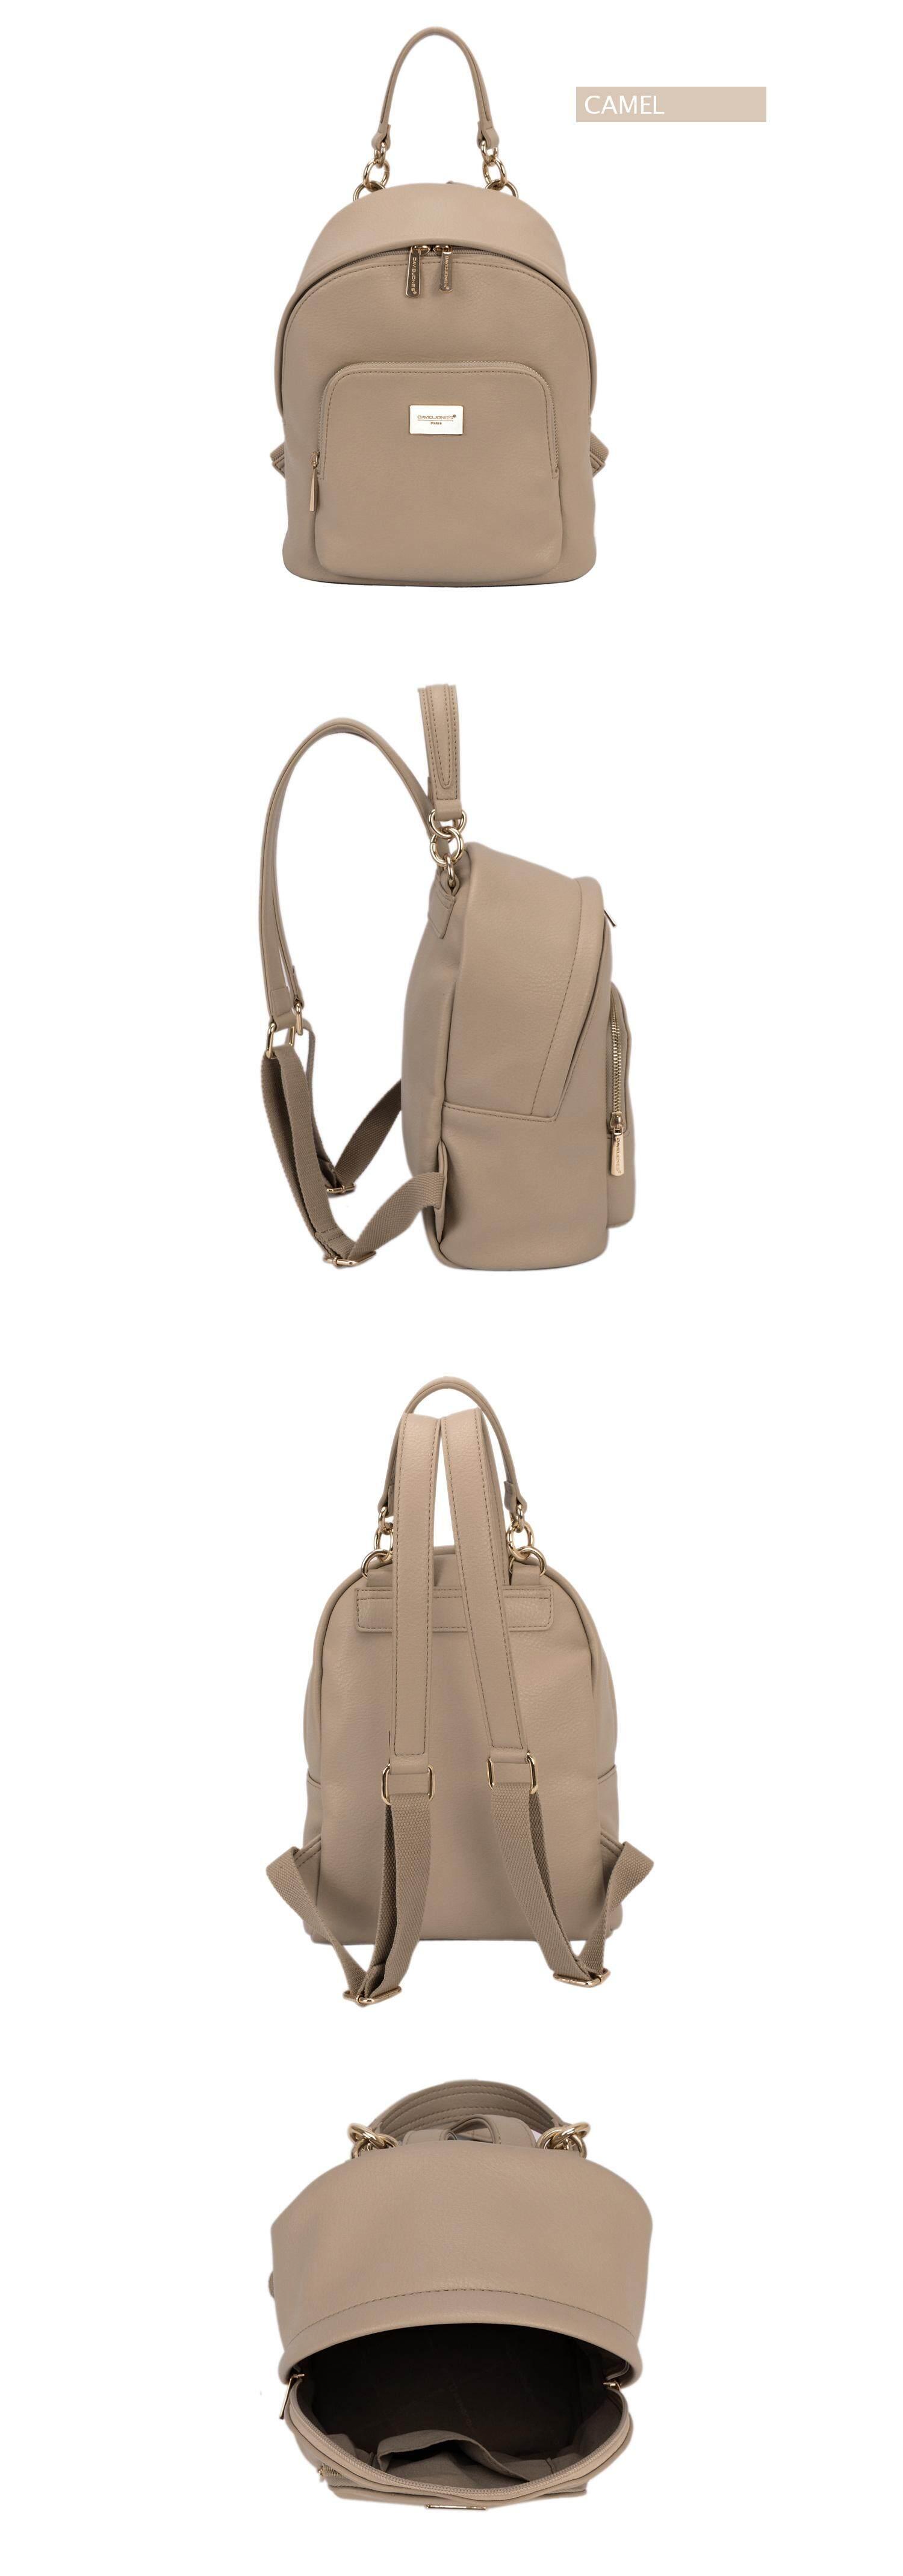 Specifications of DAVIDJONES women backpack pu leather female shoulder bag large spring plain lady back bag girl summer brand book bag free shipping stock ...